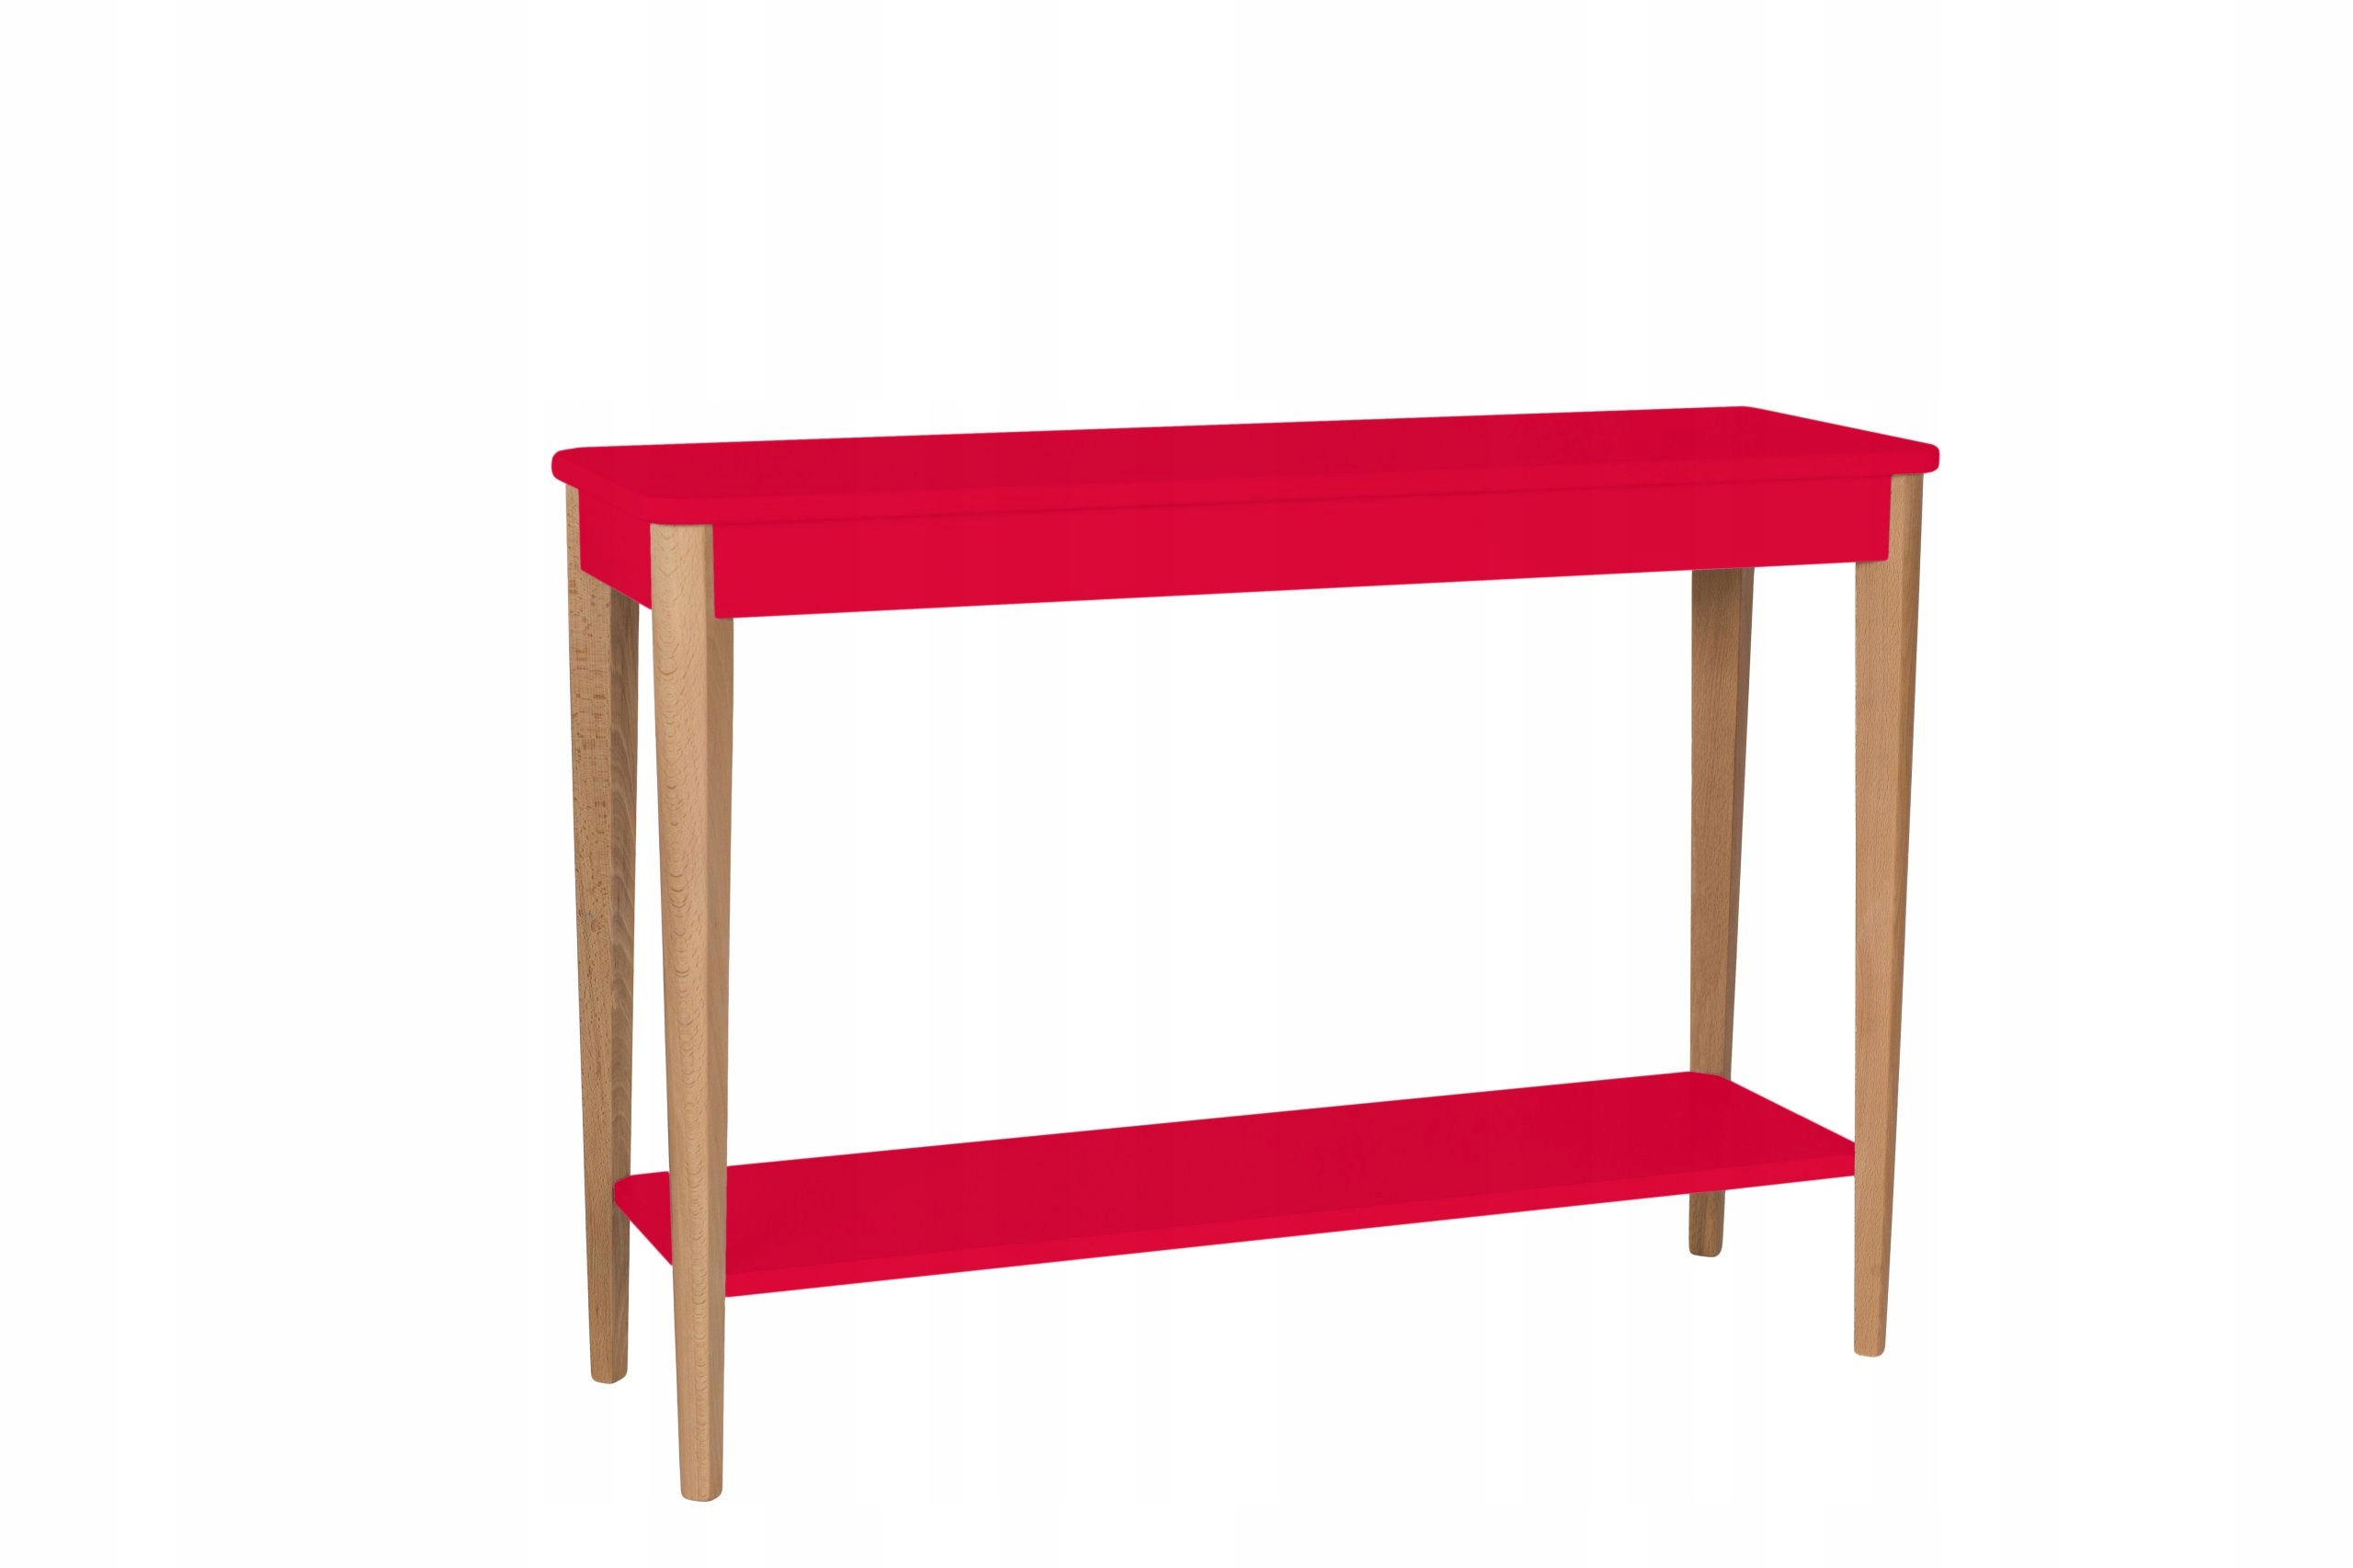 Konzoly konsolka konferenčný stolík písací Stôl červené šesť